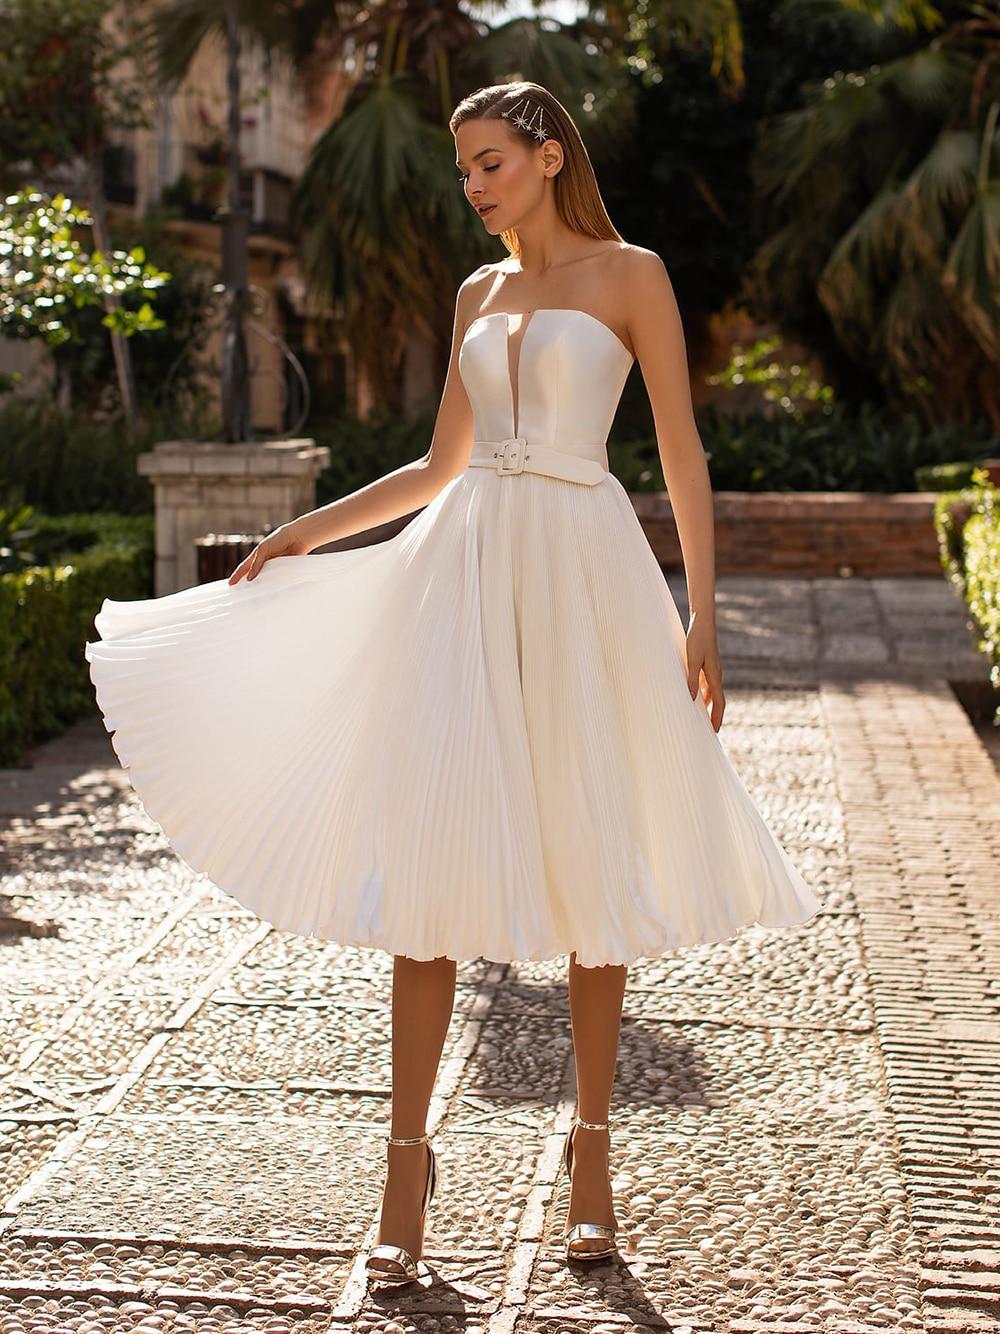 Promo Midi Knee Length Flare Pleated Satin Bridal Gowns Buckle Waist Belt Strapless Transparent Cleavage Wedding Dresses Custom Made